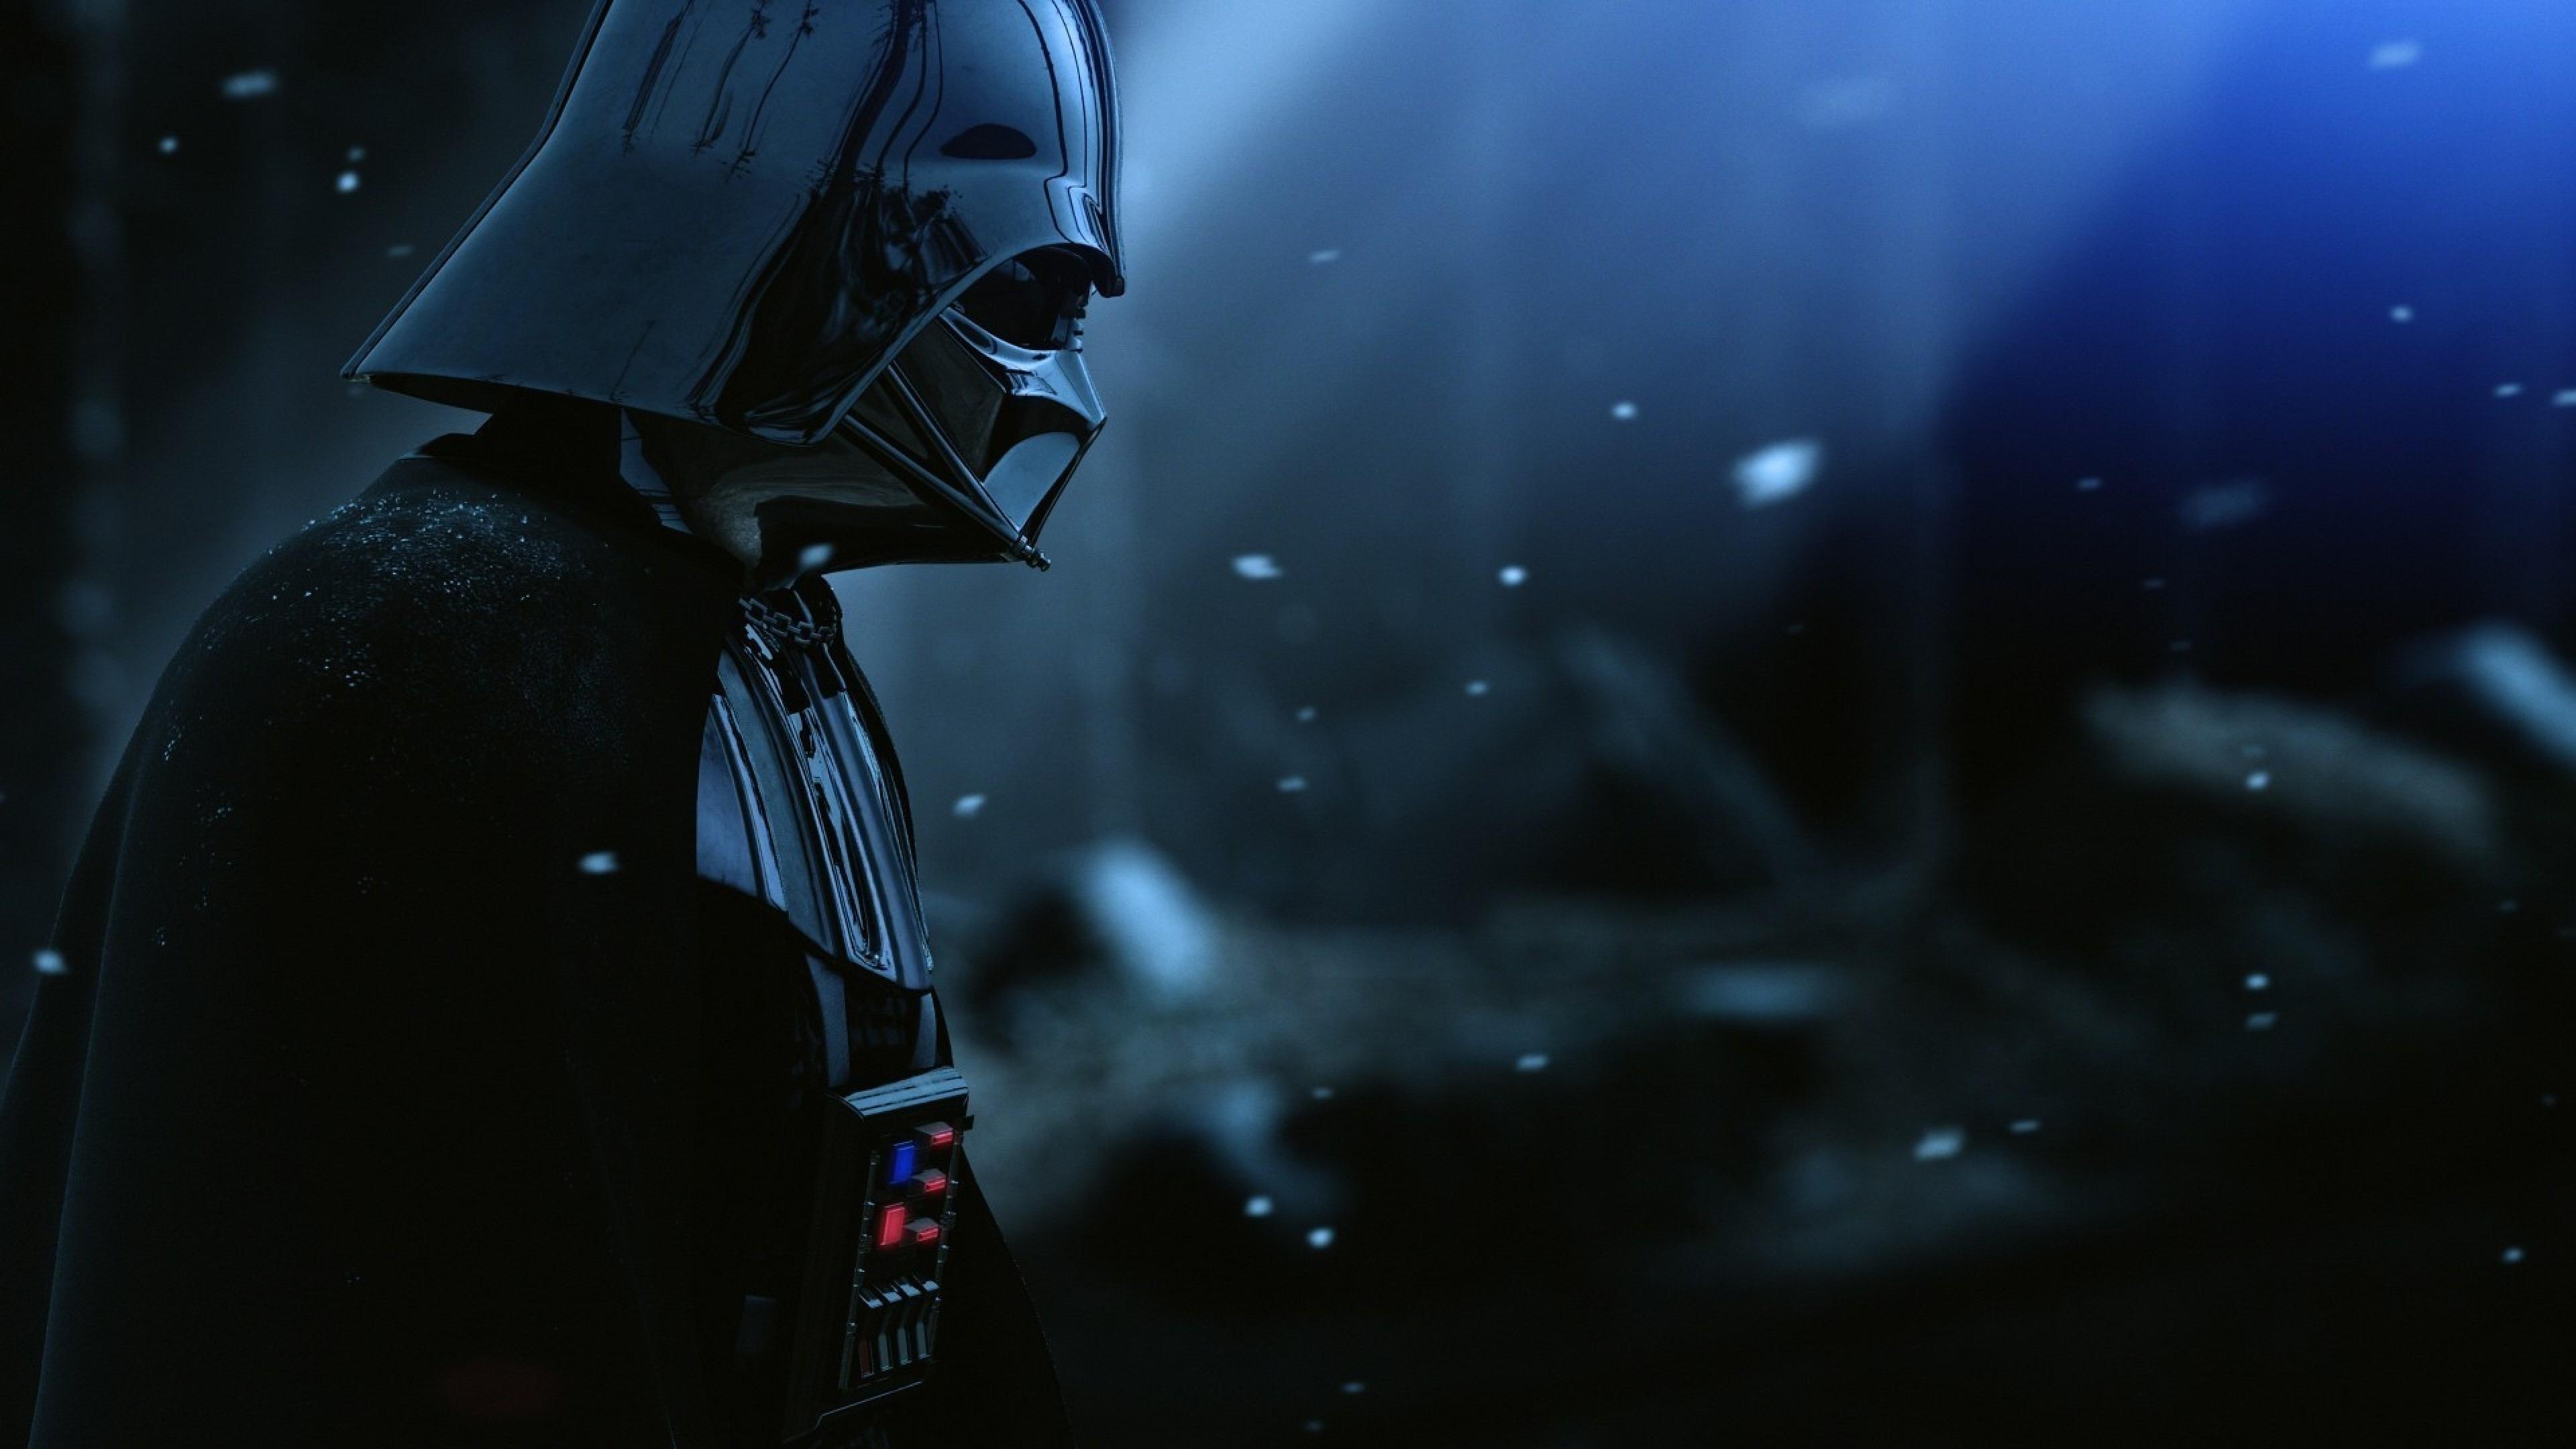 High Definition Star Wars Desktop Wallpaper 1920x1080